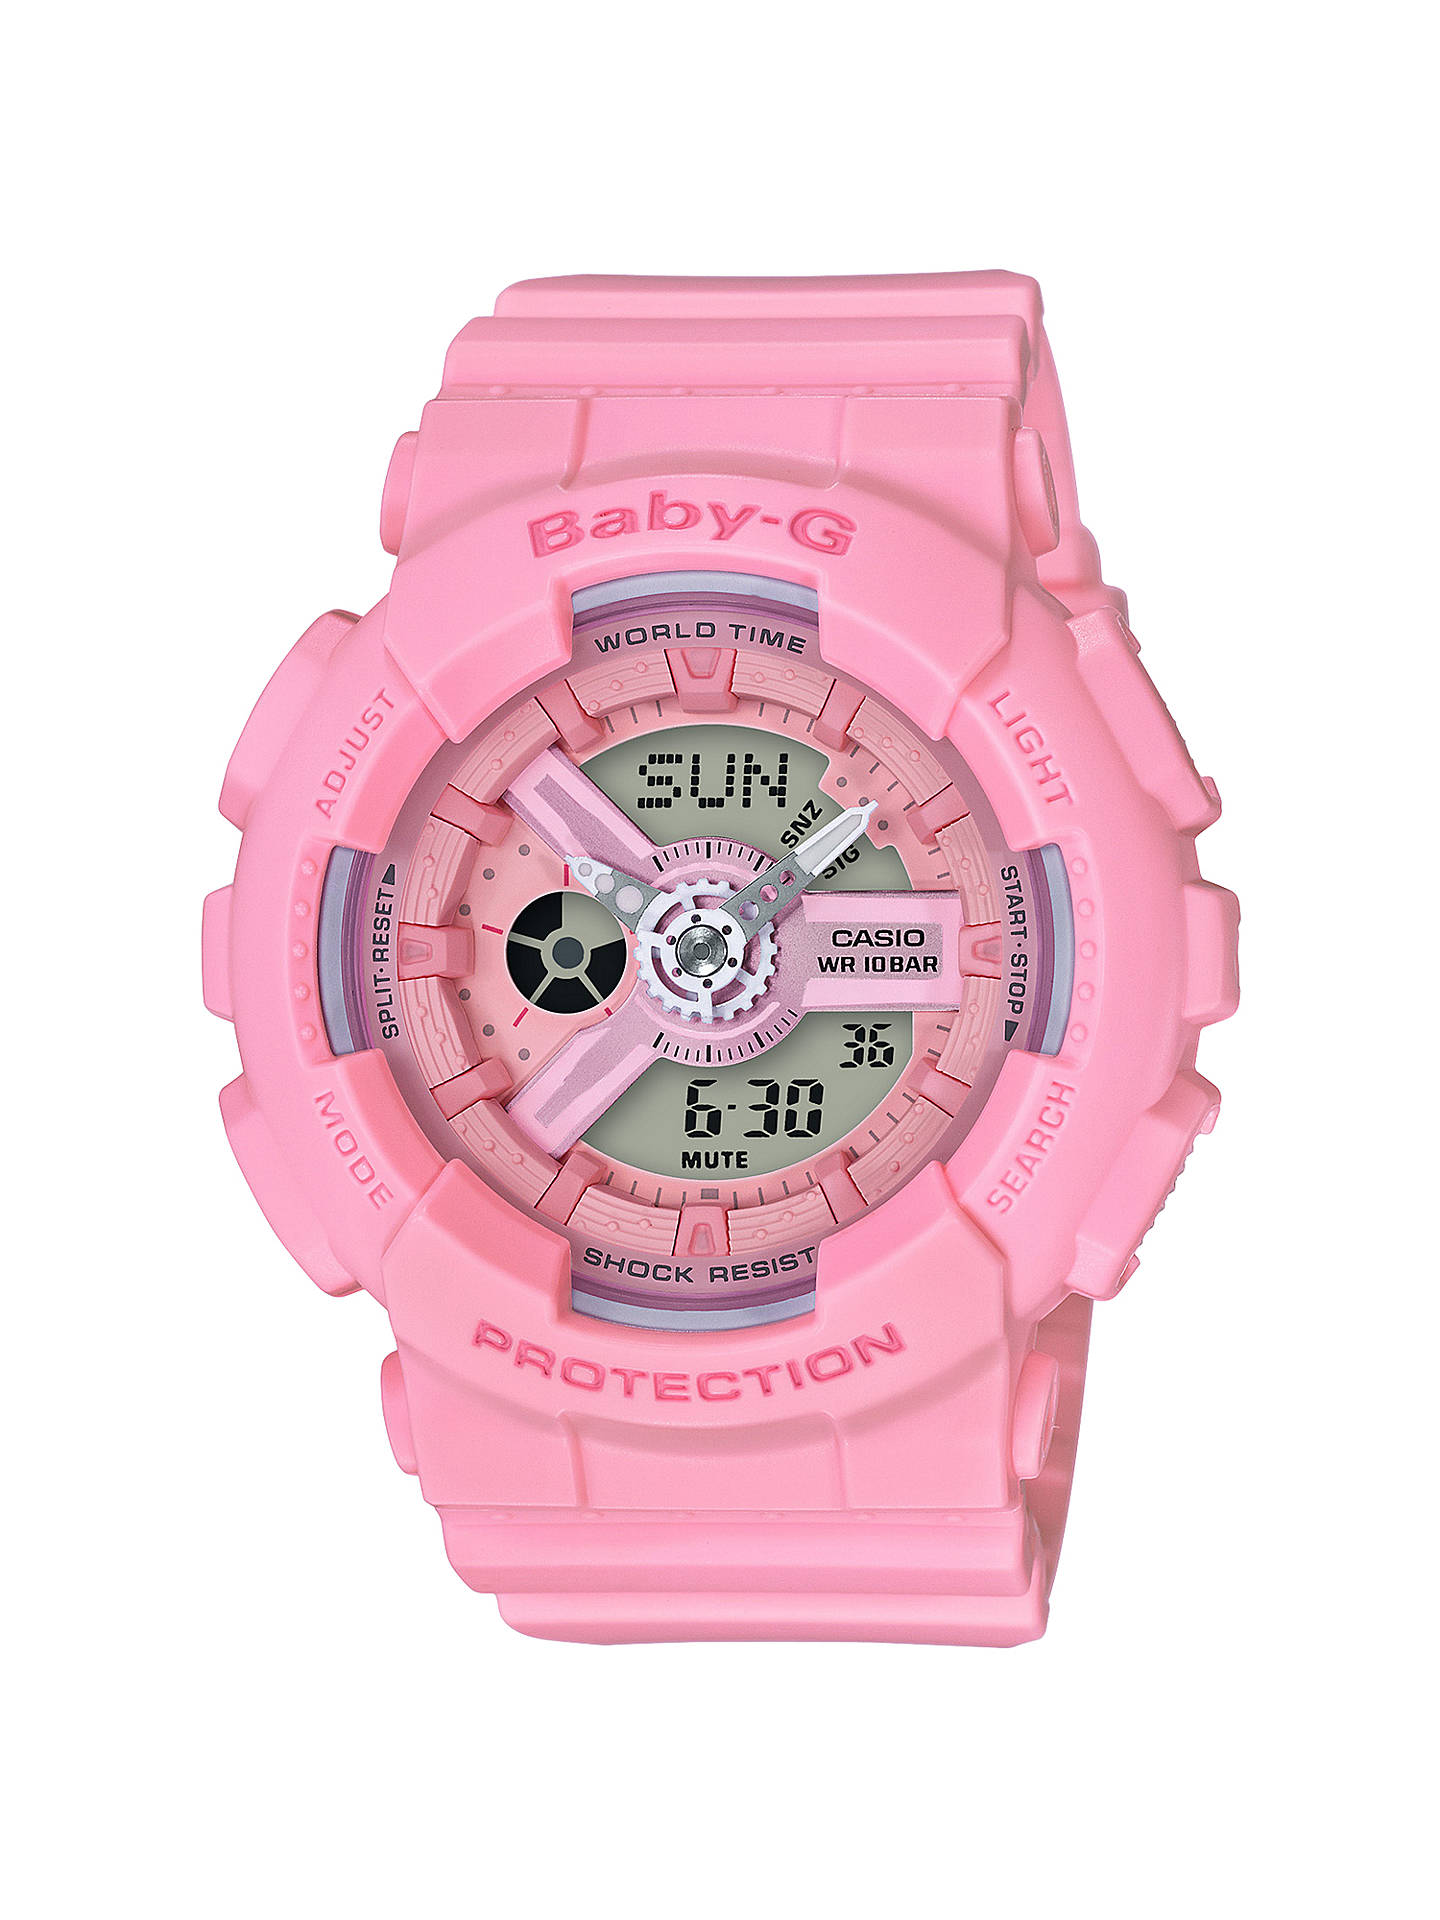 3247b56df Buy Casio Women's Baby G BA-110 Quartz Resin Strap Watch, Pink Online at